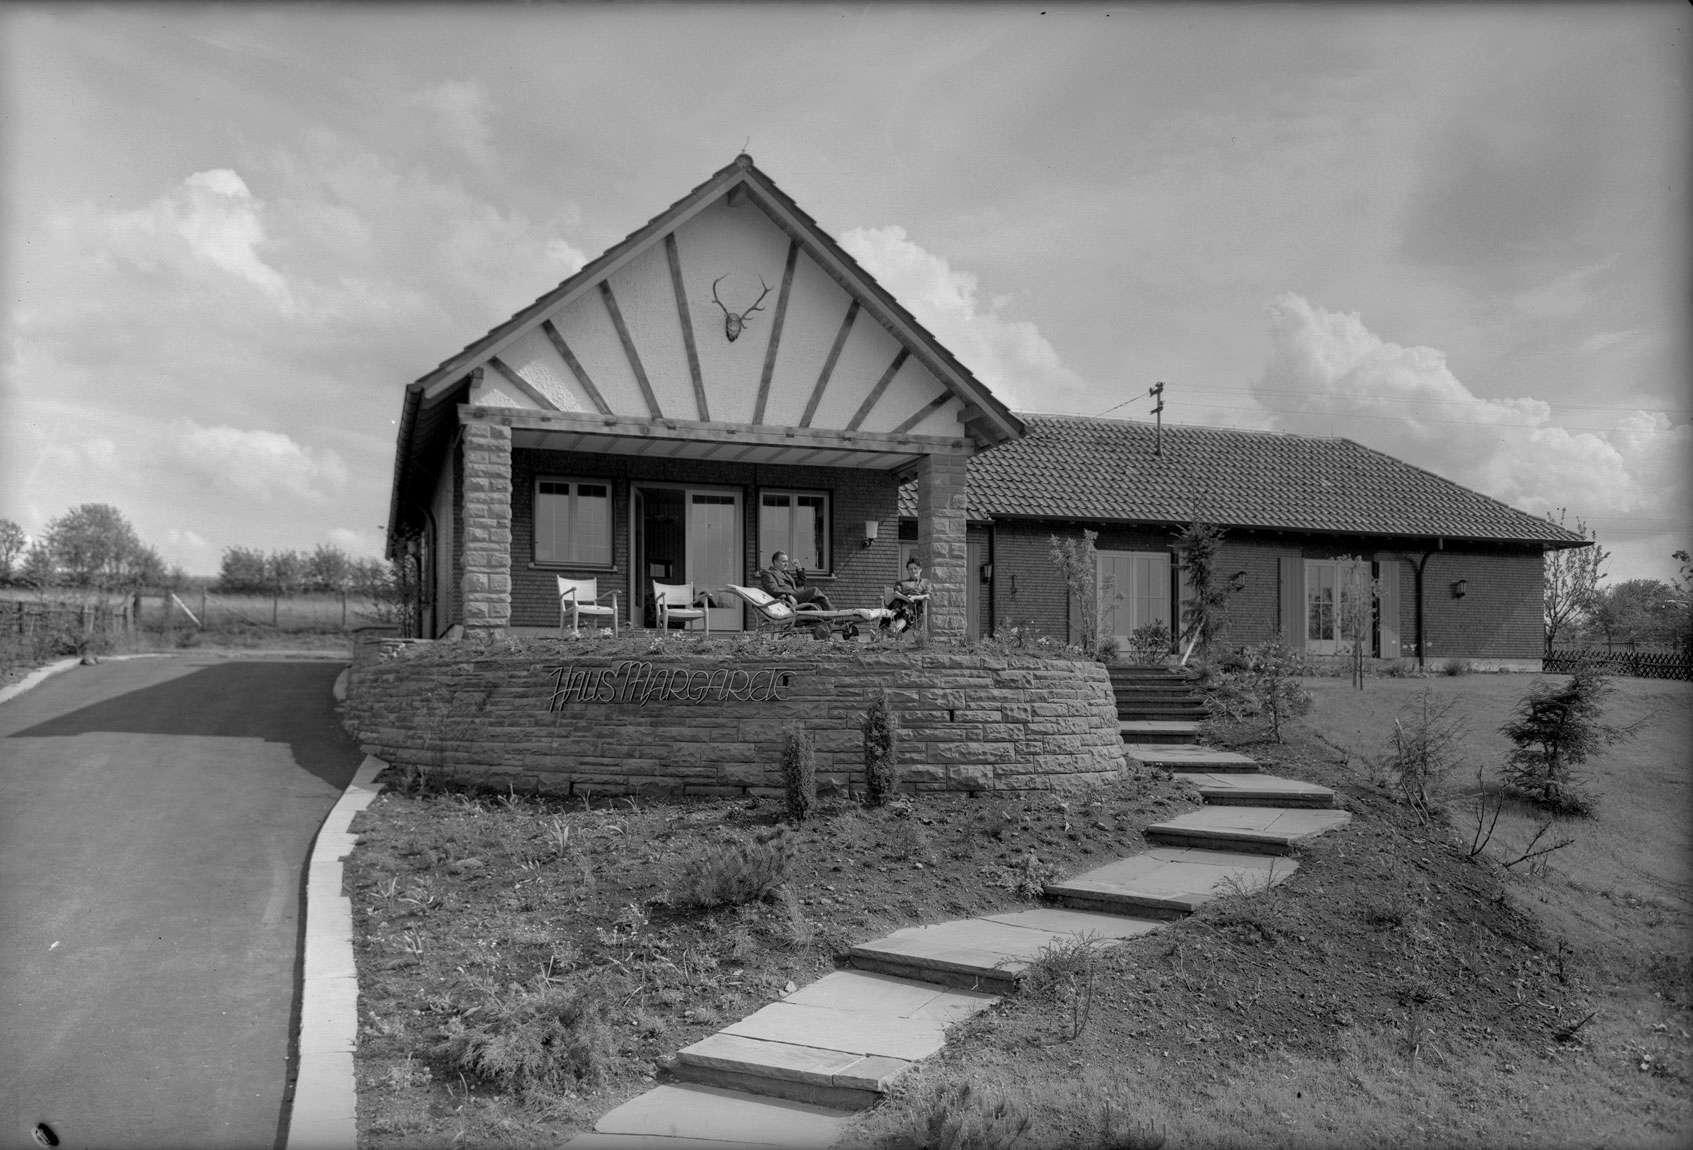 Wildbad / Neuenbürg / Würzbach u.a. 1956, Nr 003